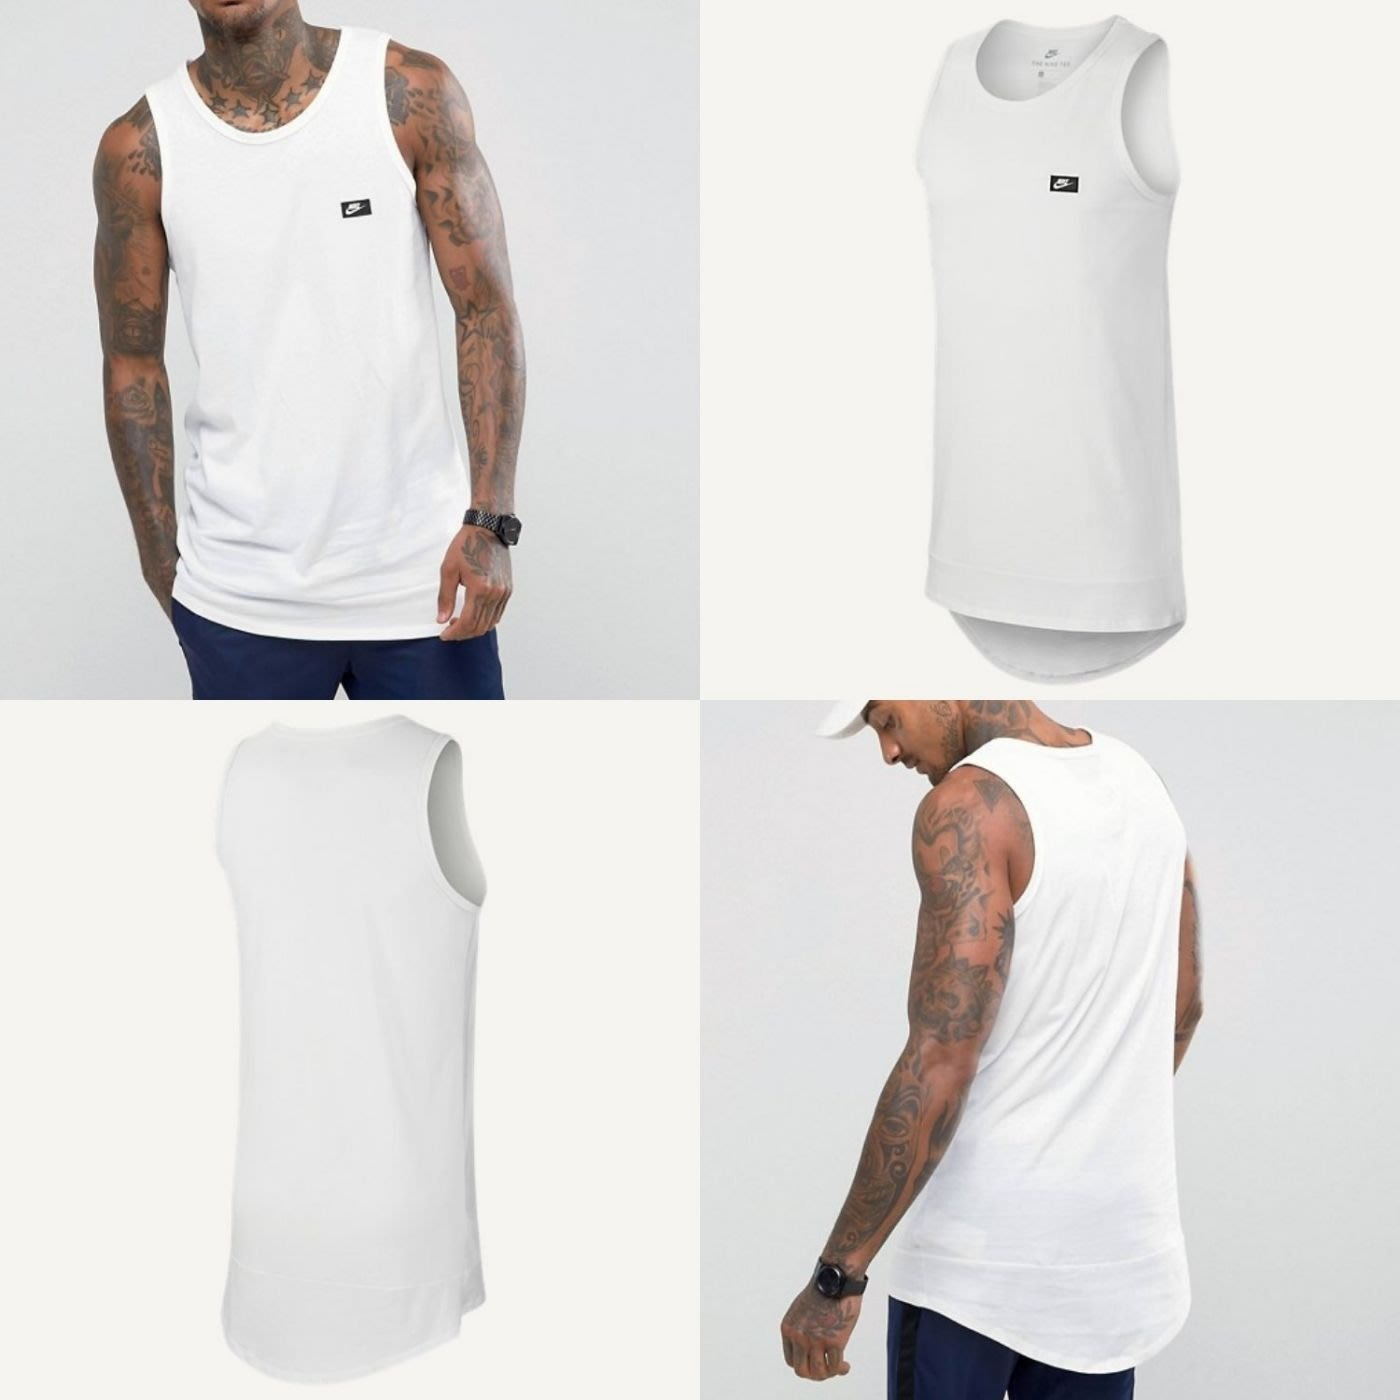 56ffc5907a27 Nike Modern Basic Vest 886030-100 長版背心純棉國外熱賣款保證全新正品 ...